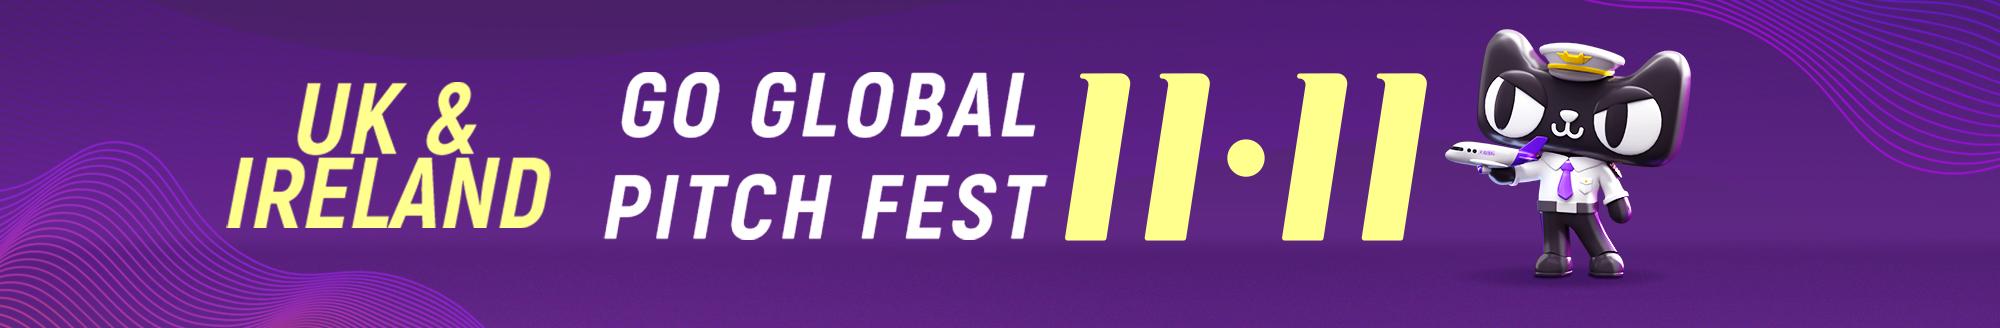 UK & Ireland Go Global Pitch Fest 11.11